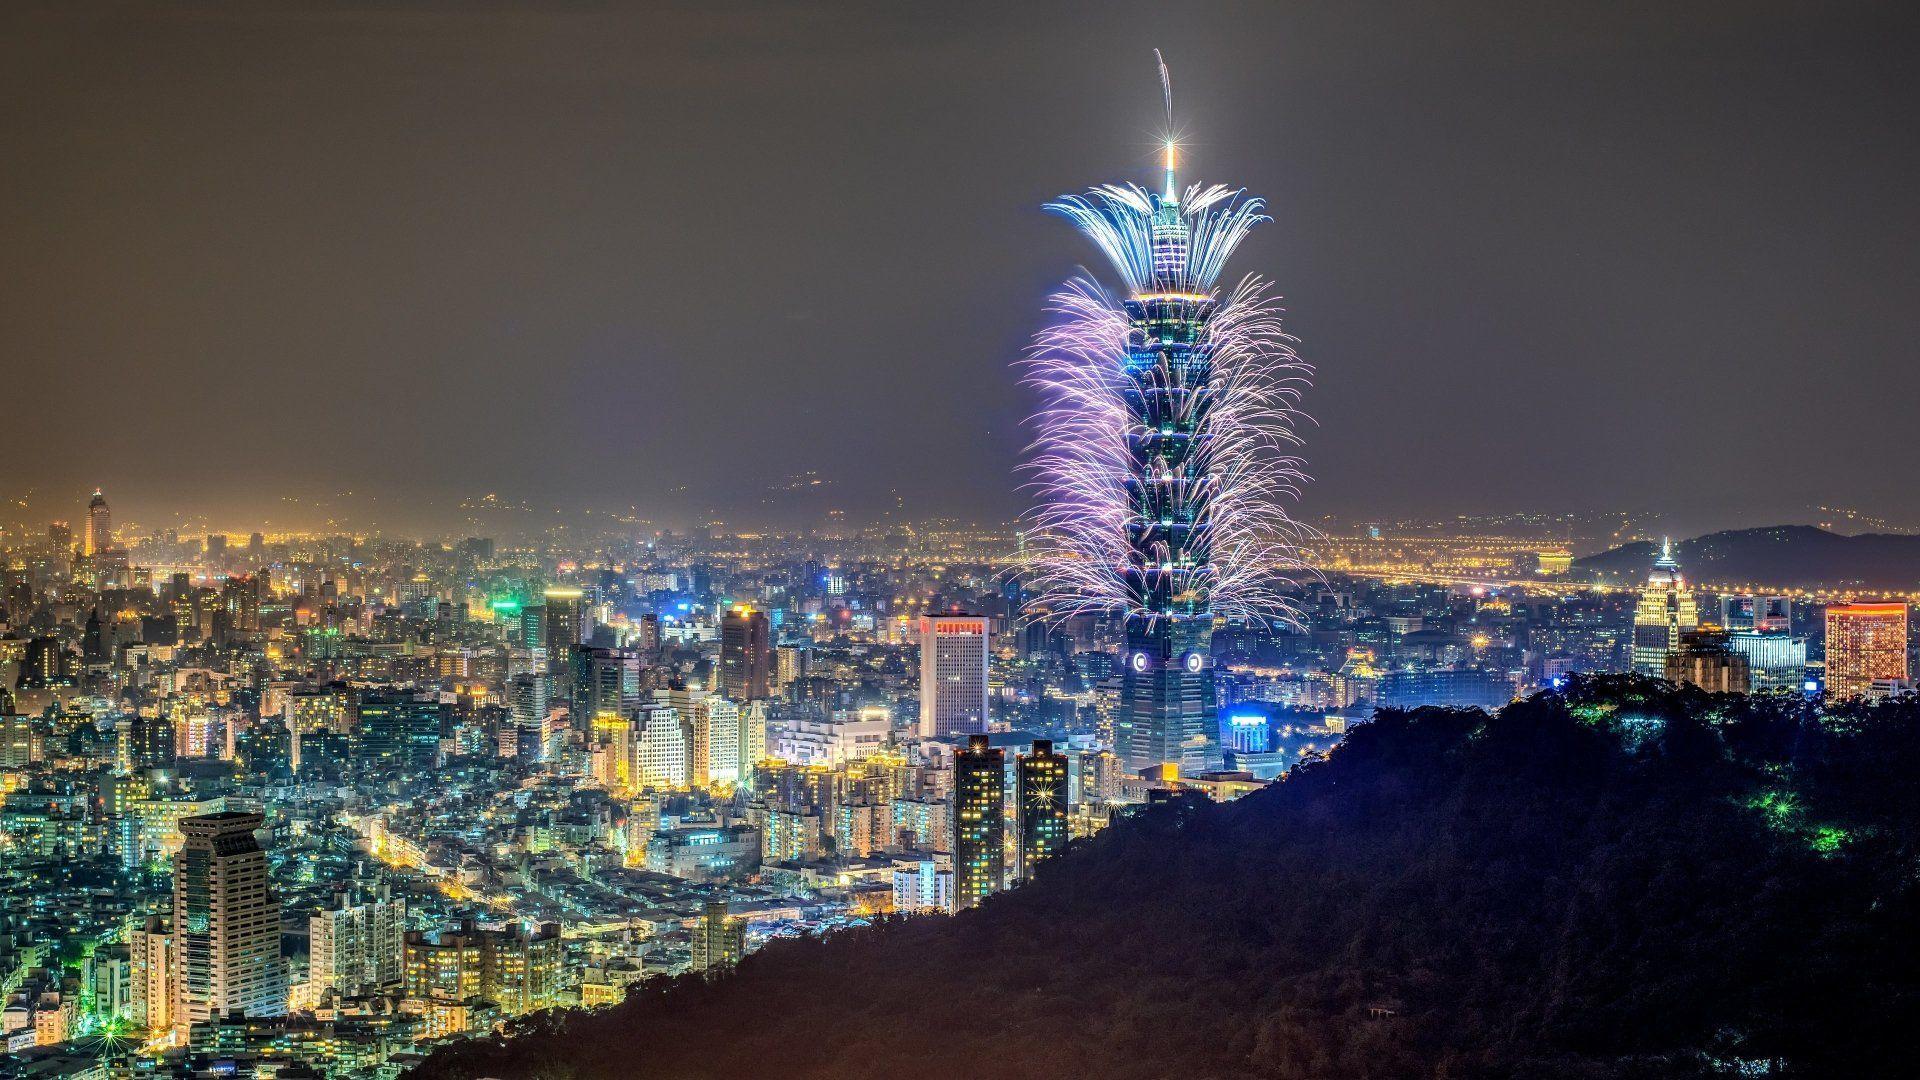 Taipei 4k Wallpapers Top Free Taipei 4k Backgrounds Wallpaperaccess